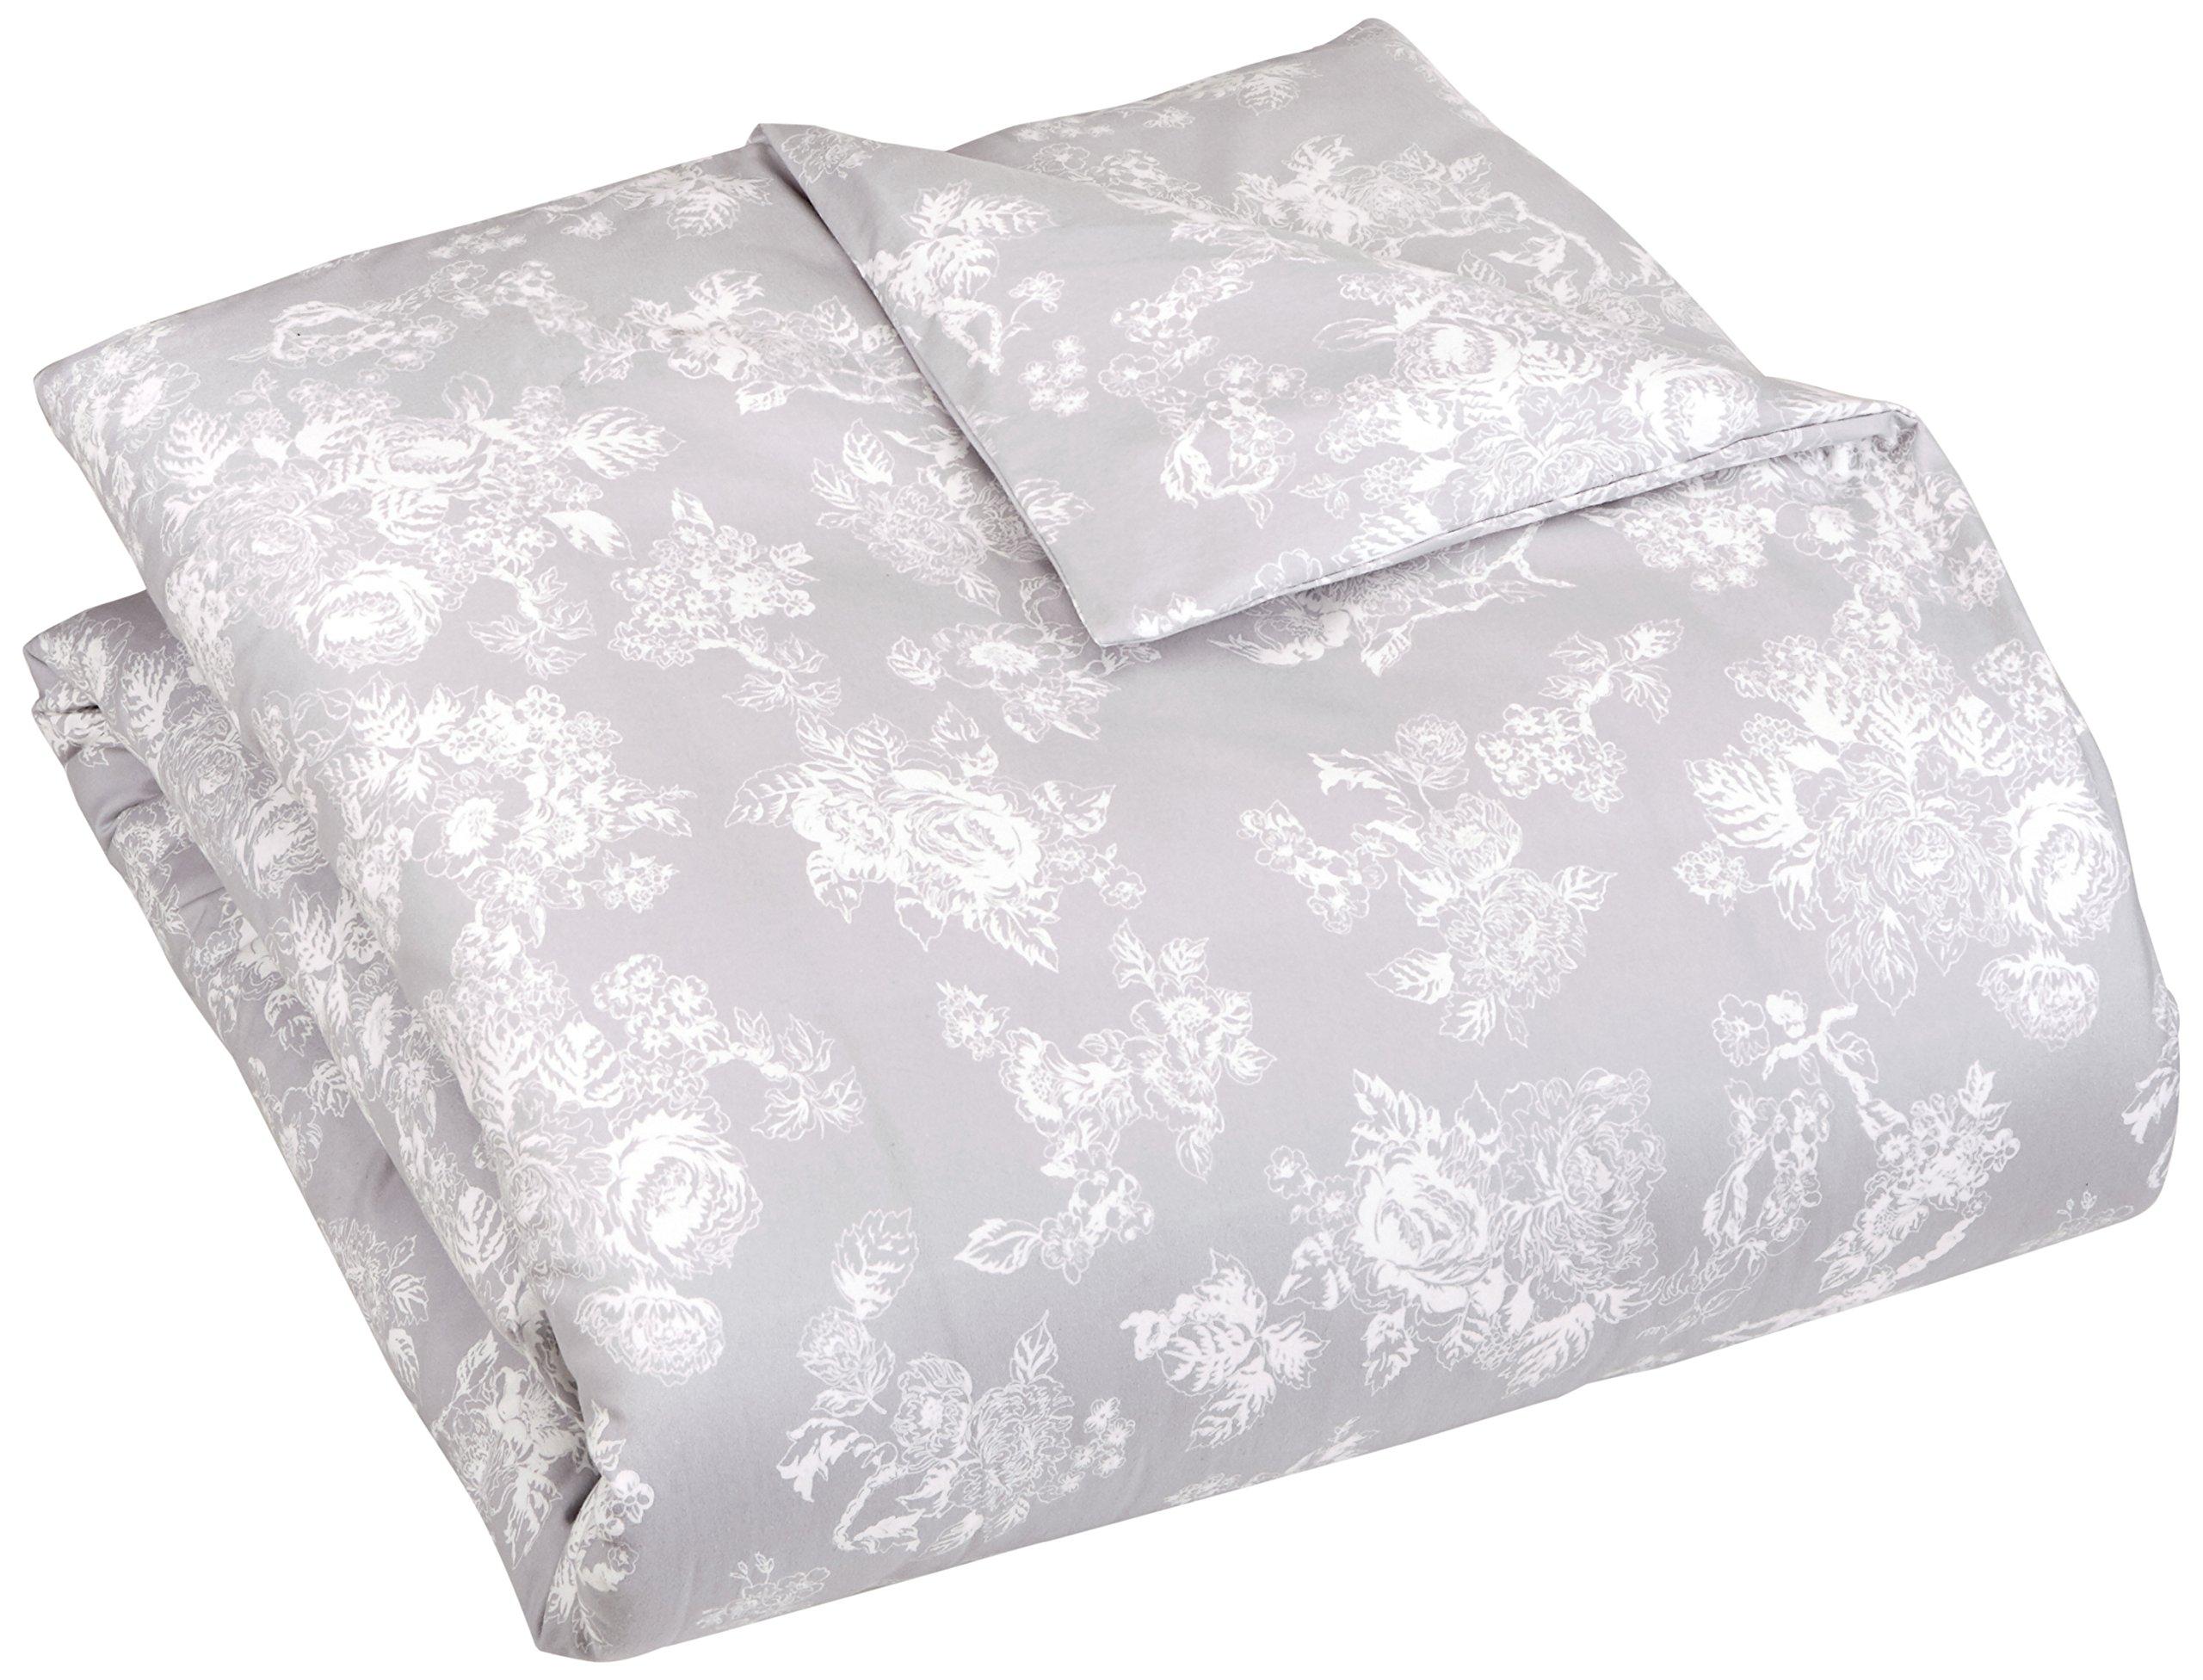 pinzon 170 gram flannel duvet cover full queen floral grey 841710139945 ebay. Black Bedroom Furniture Sets. Home Design Ideas